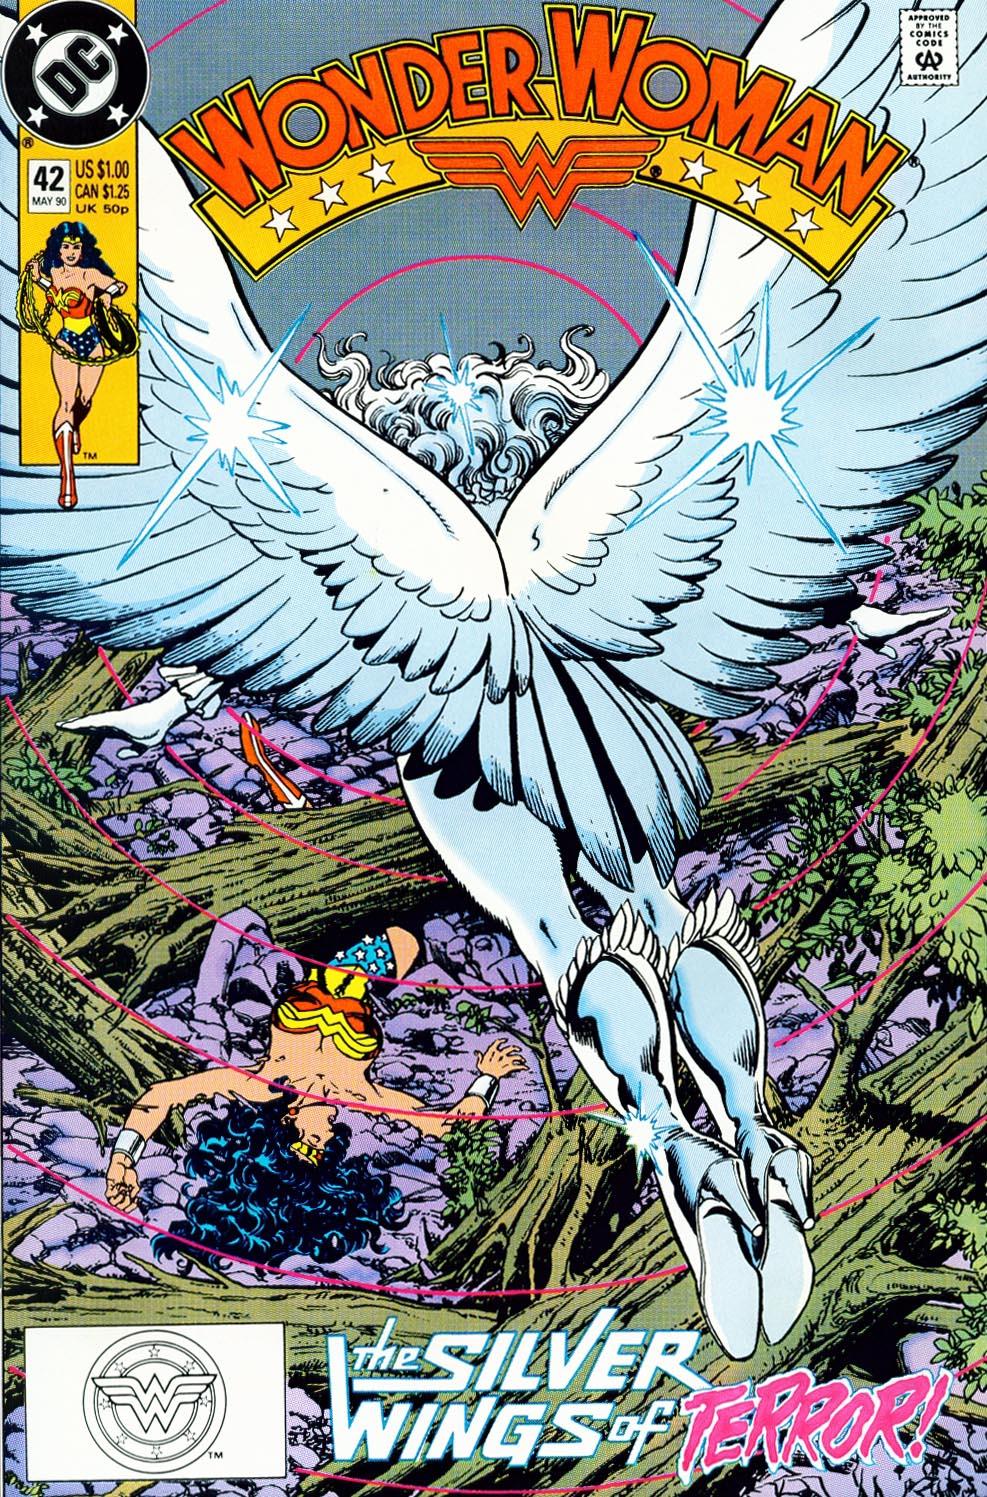 Read online Wonder Woman (1987) comic -  Issue #42 - 2